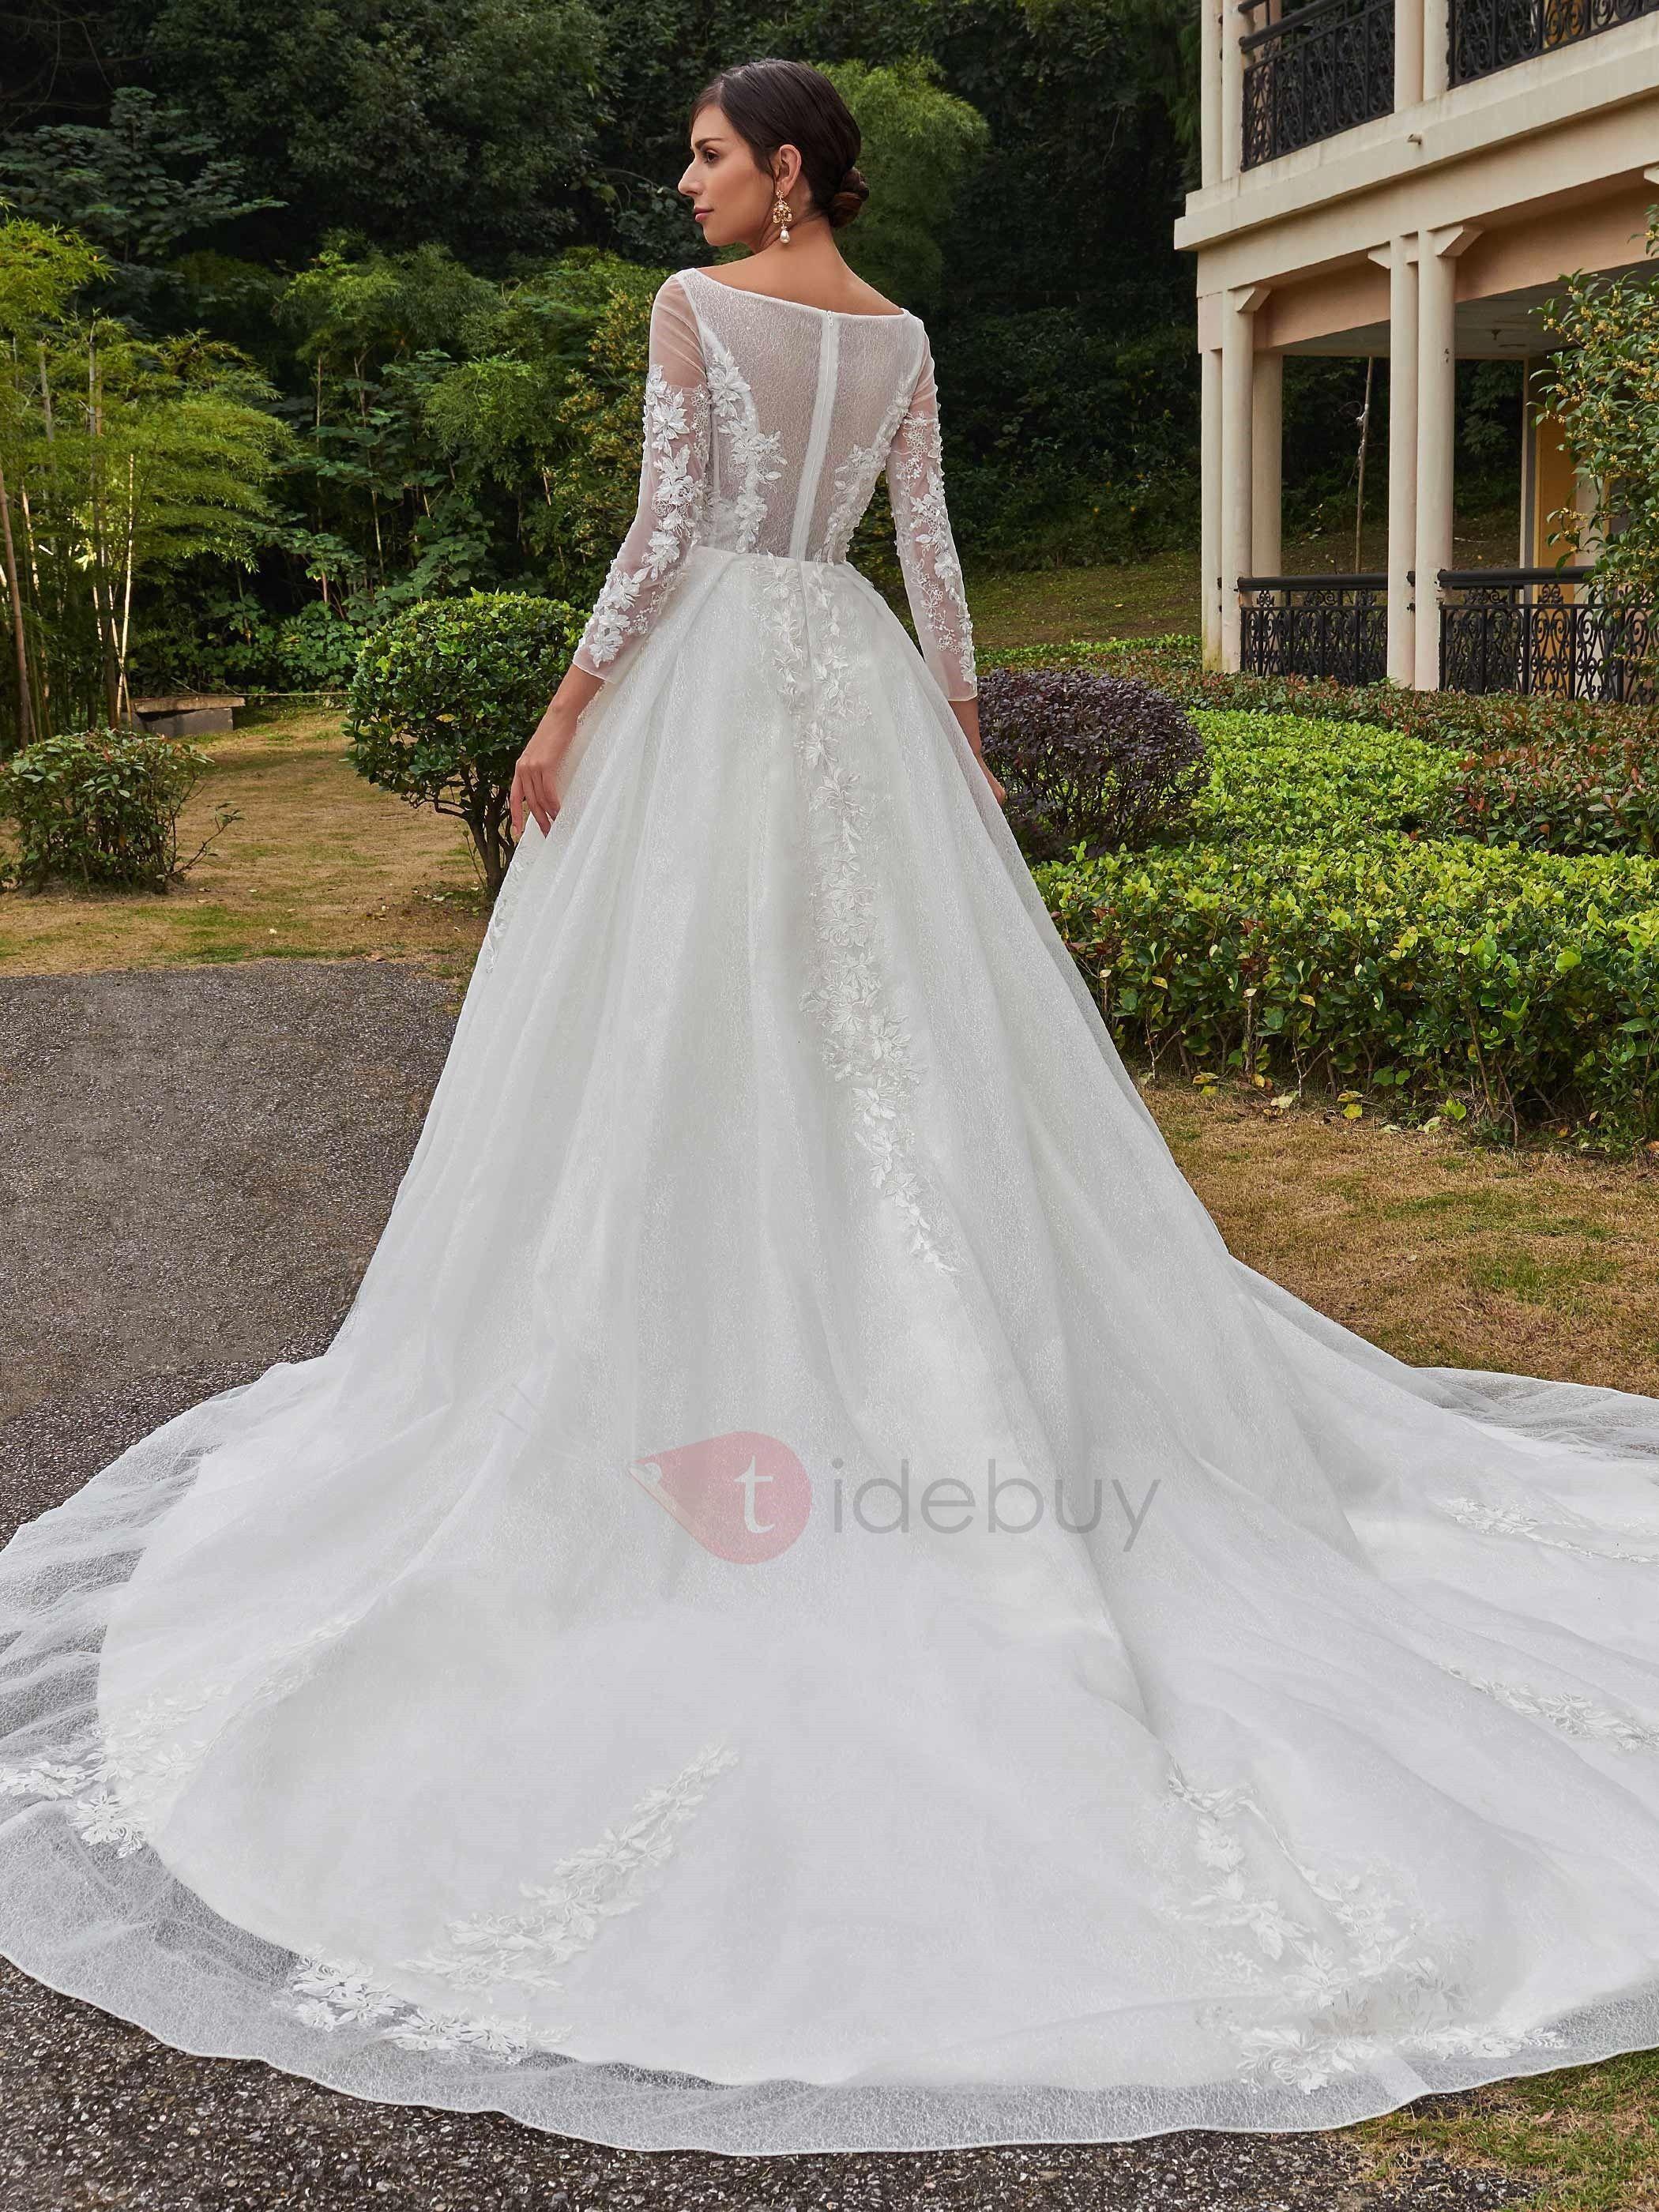 Square neck appliques long sleeves wedding dress wedding dress